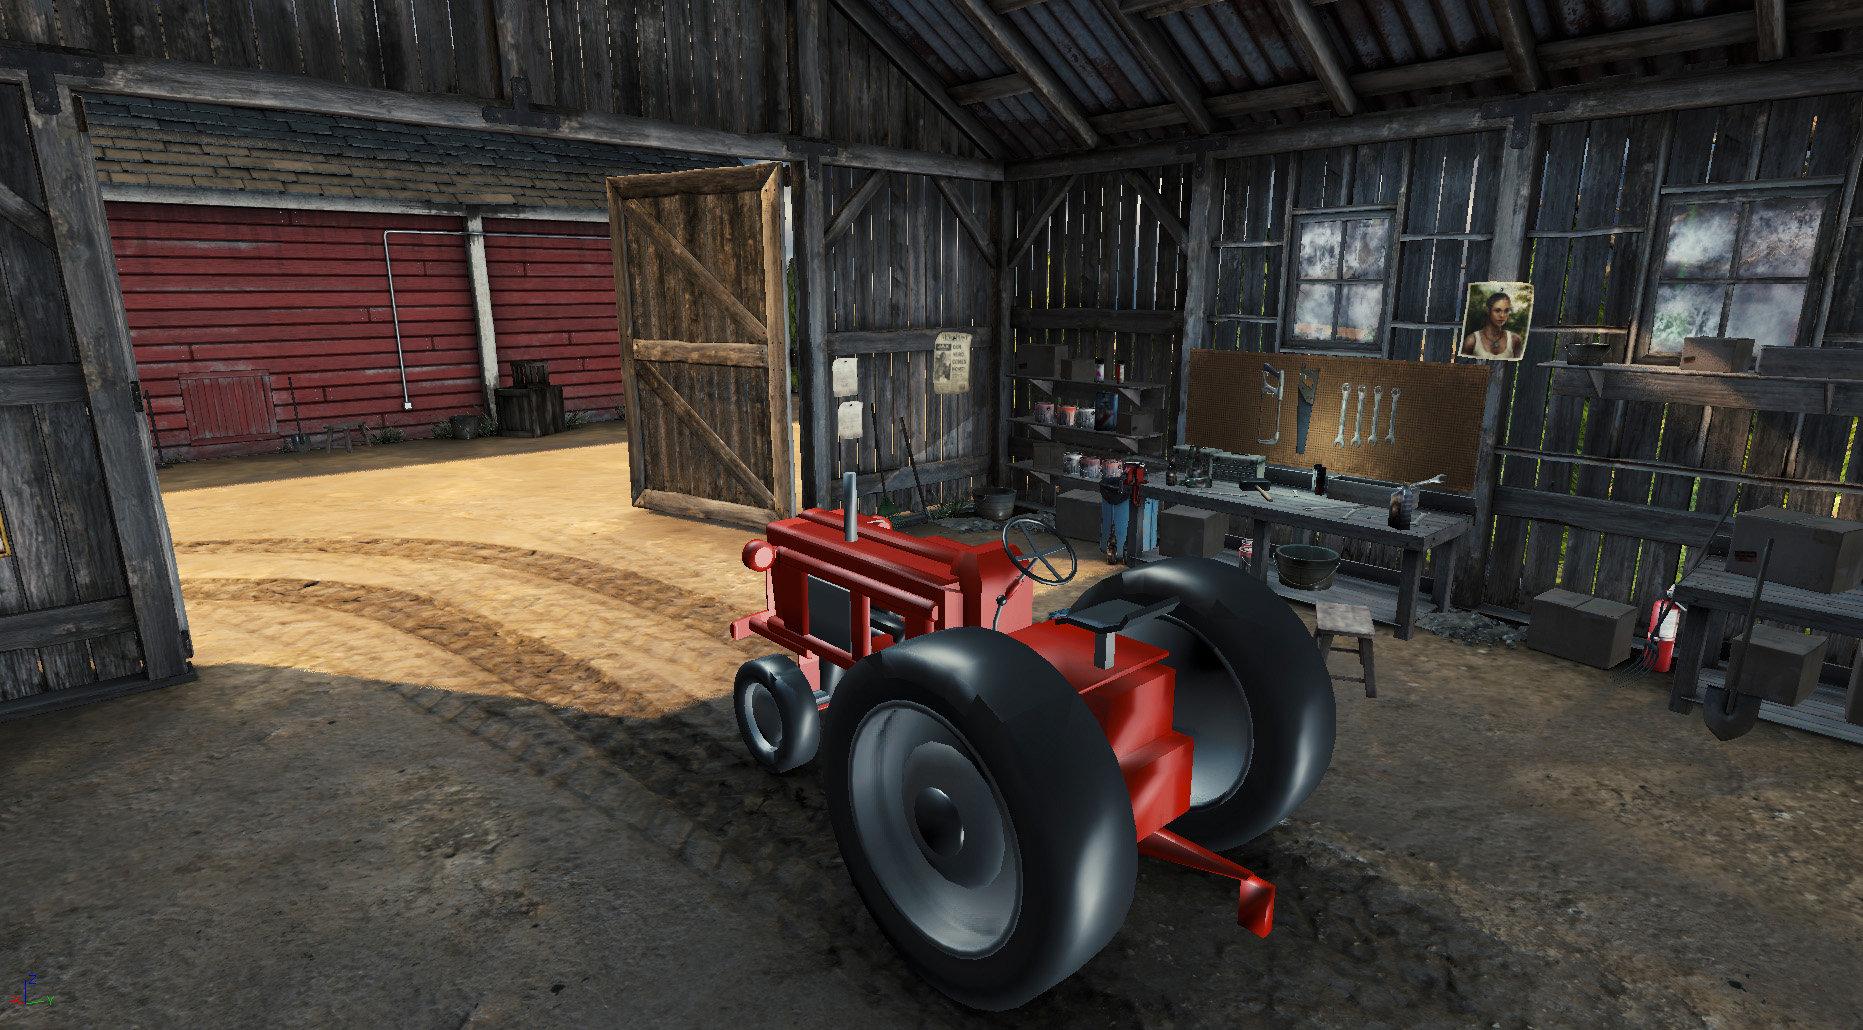 Dennis glowacki jax farm1